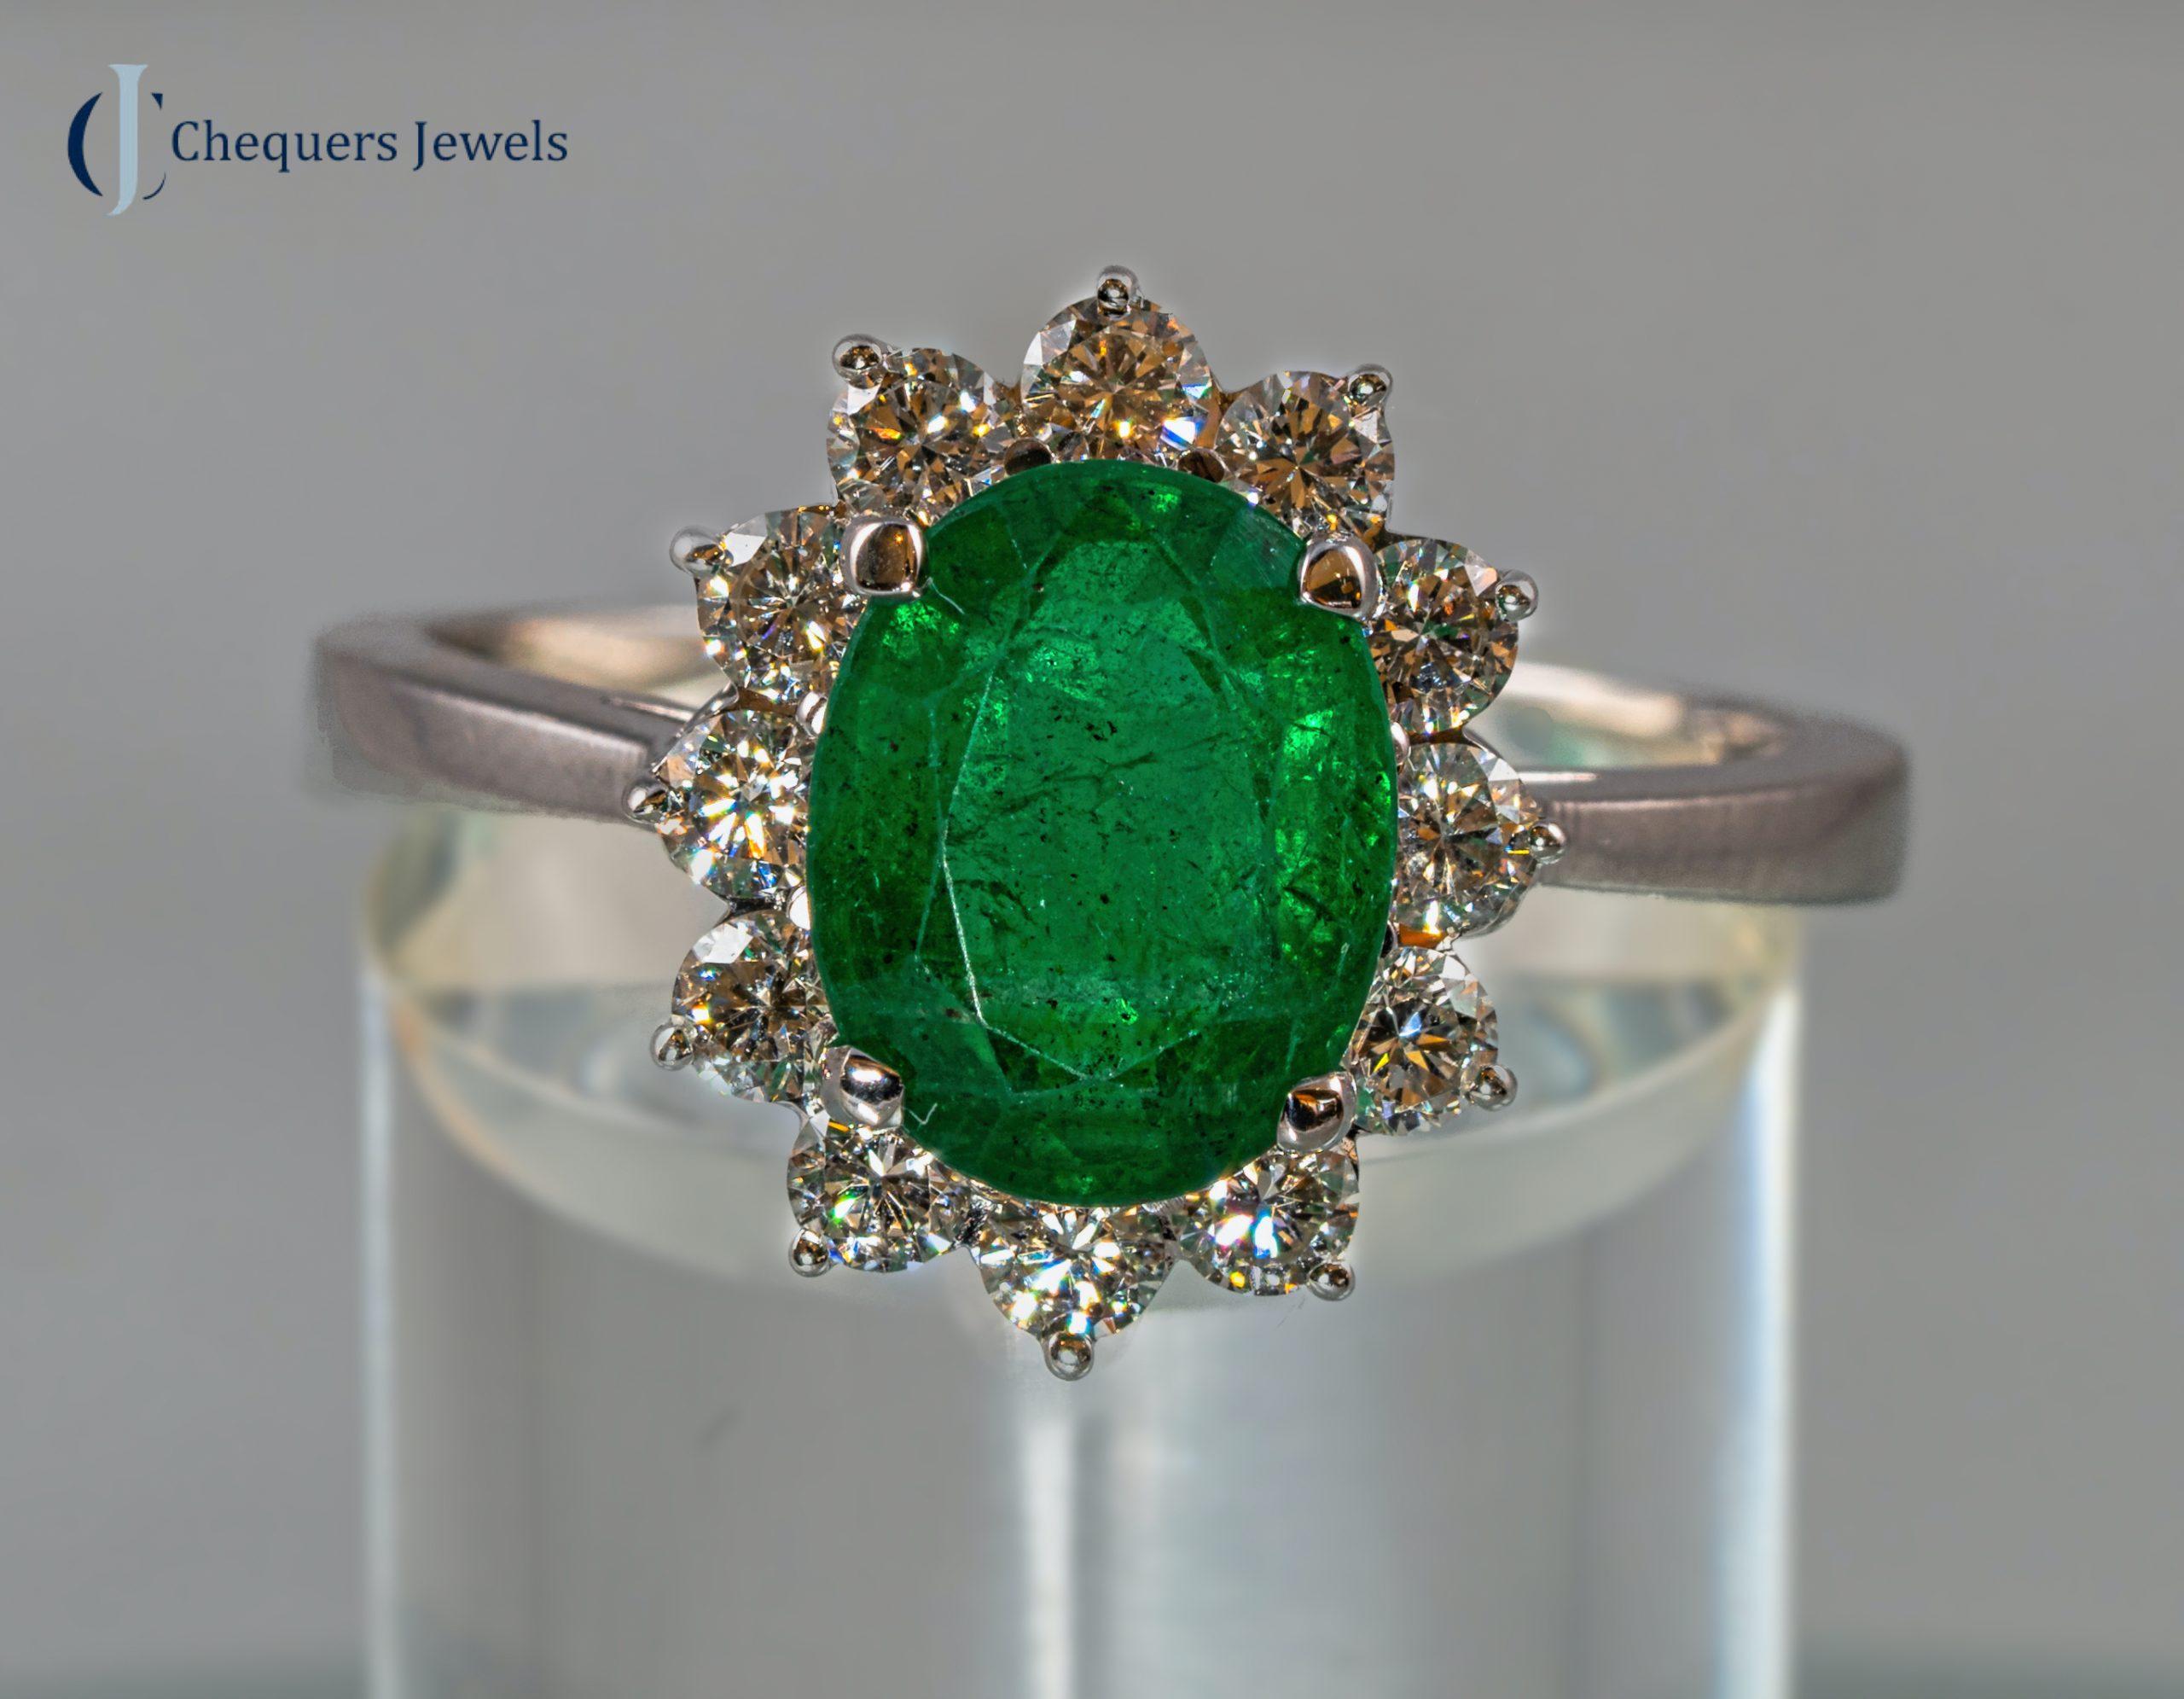 jewellers in chichester